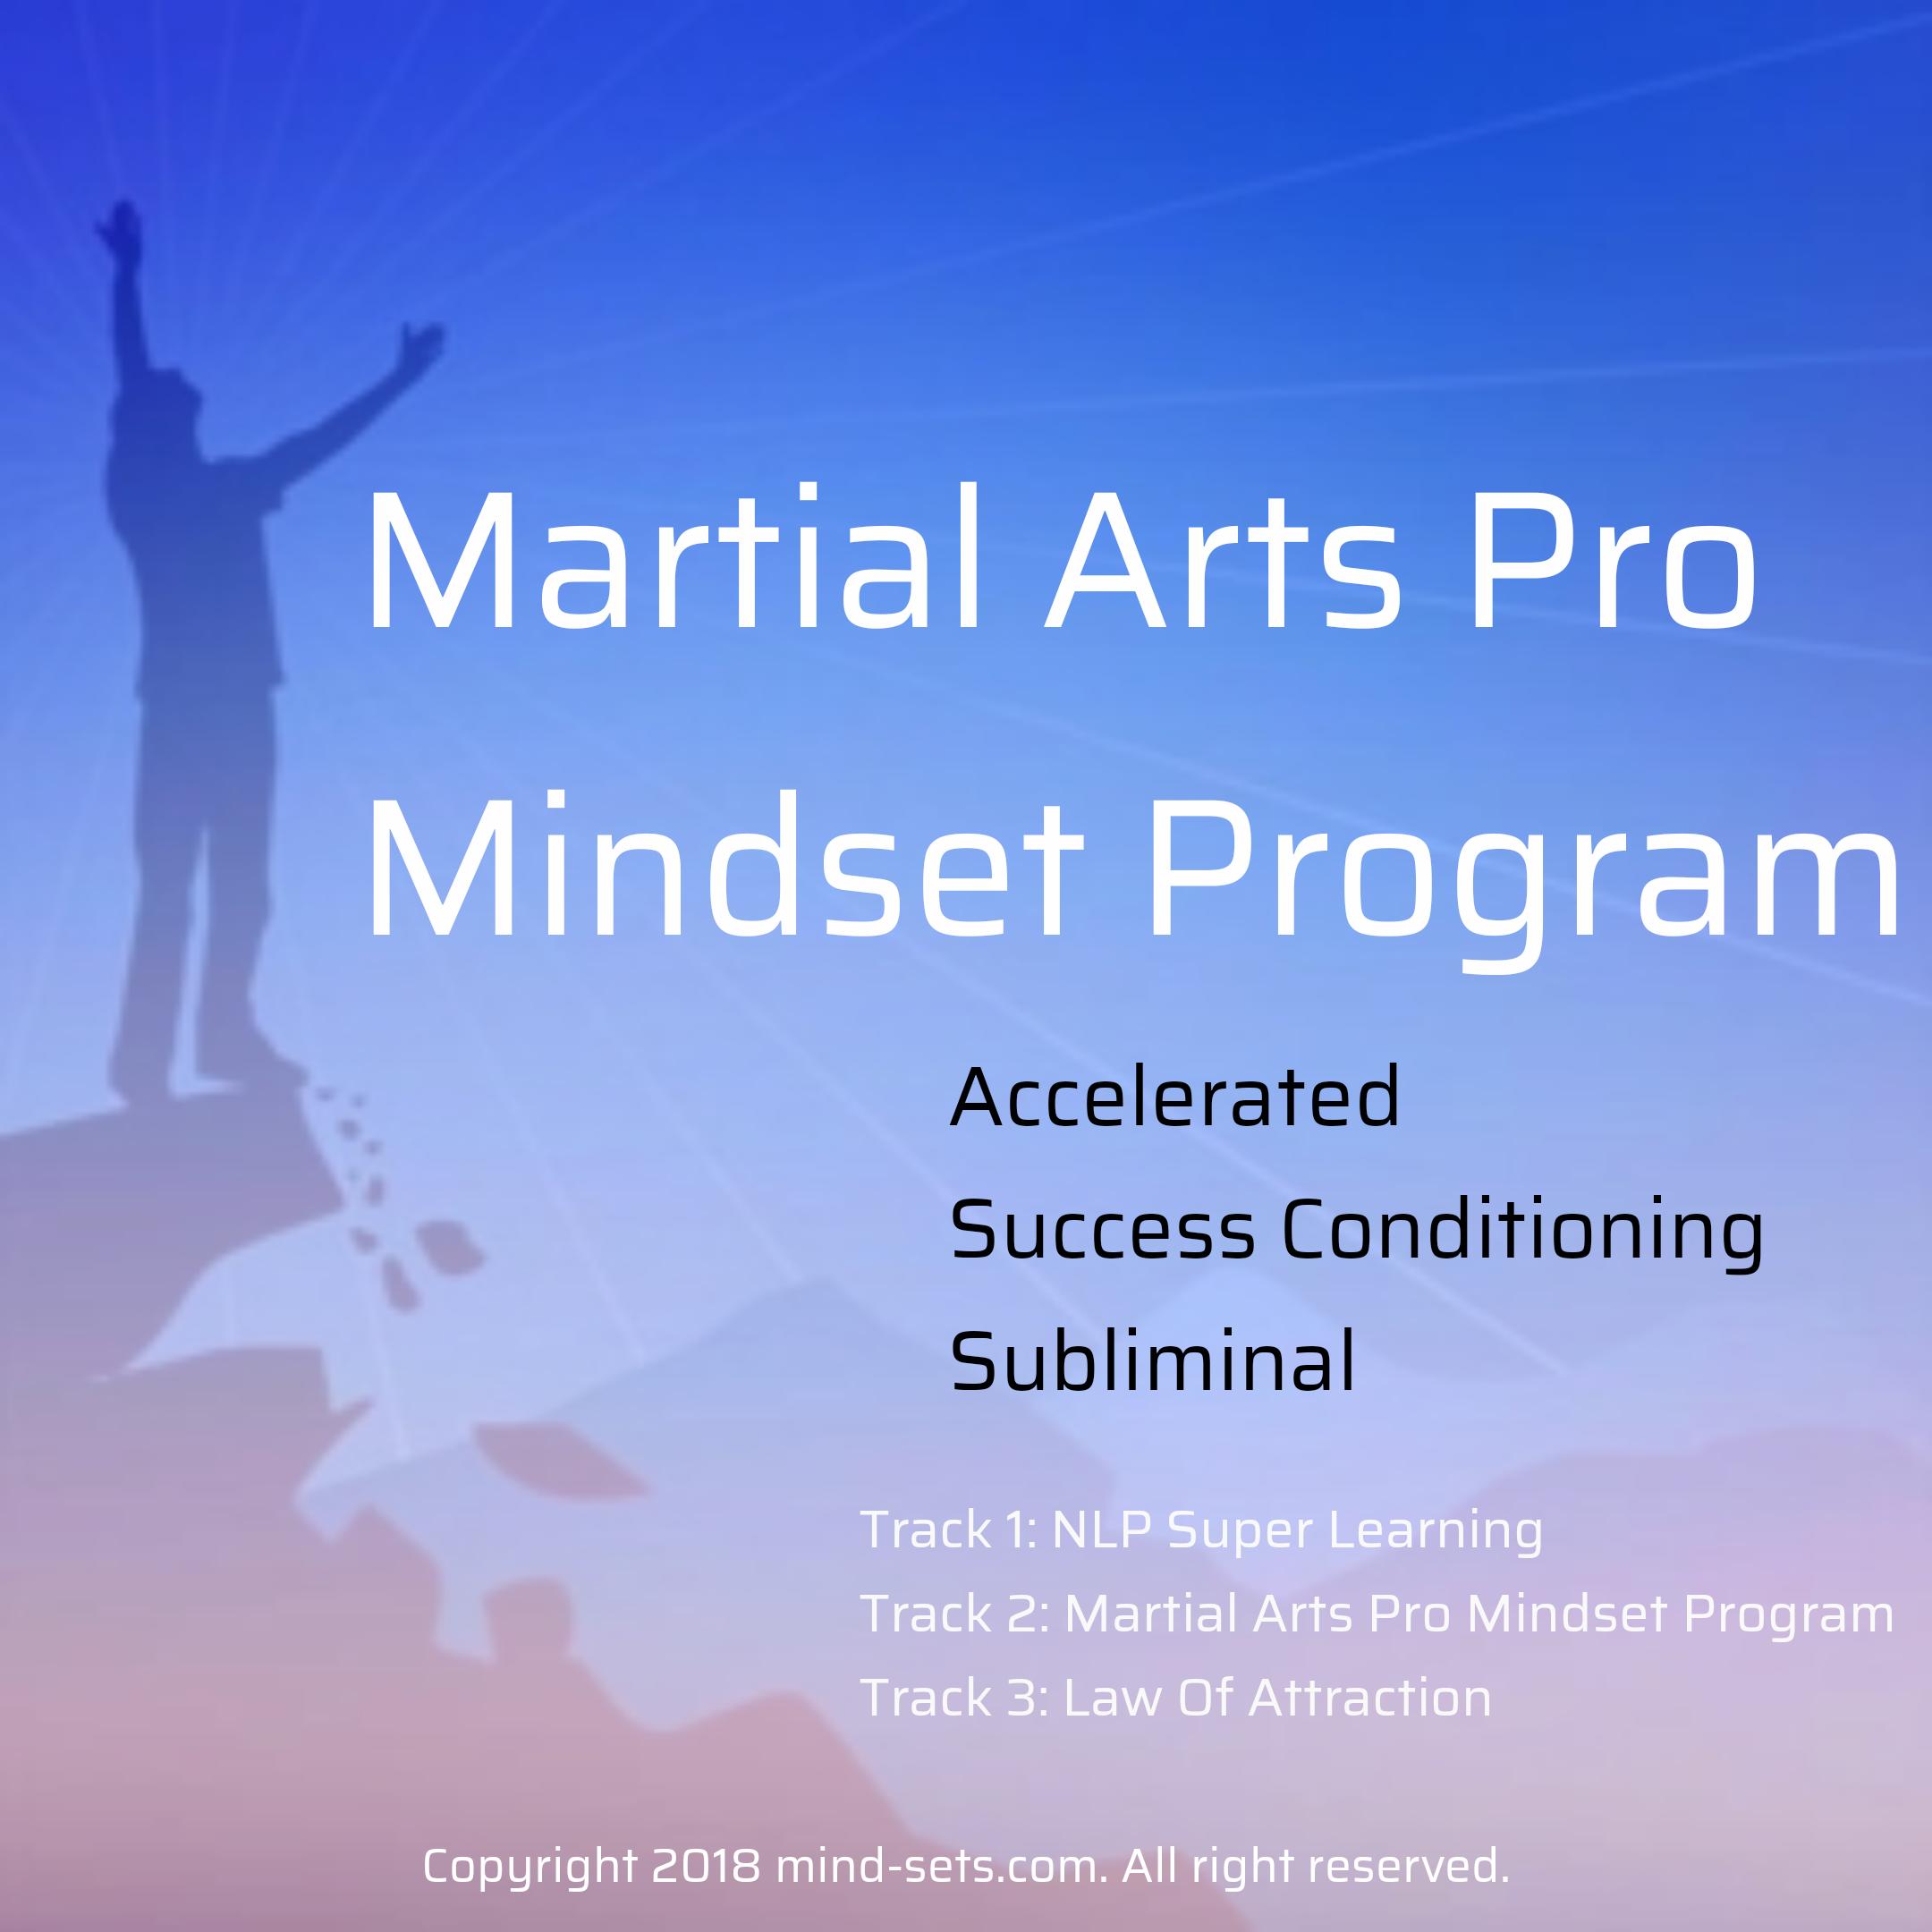 Martial Arts Pro Mindset Program